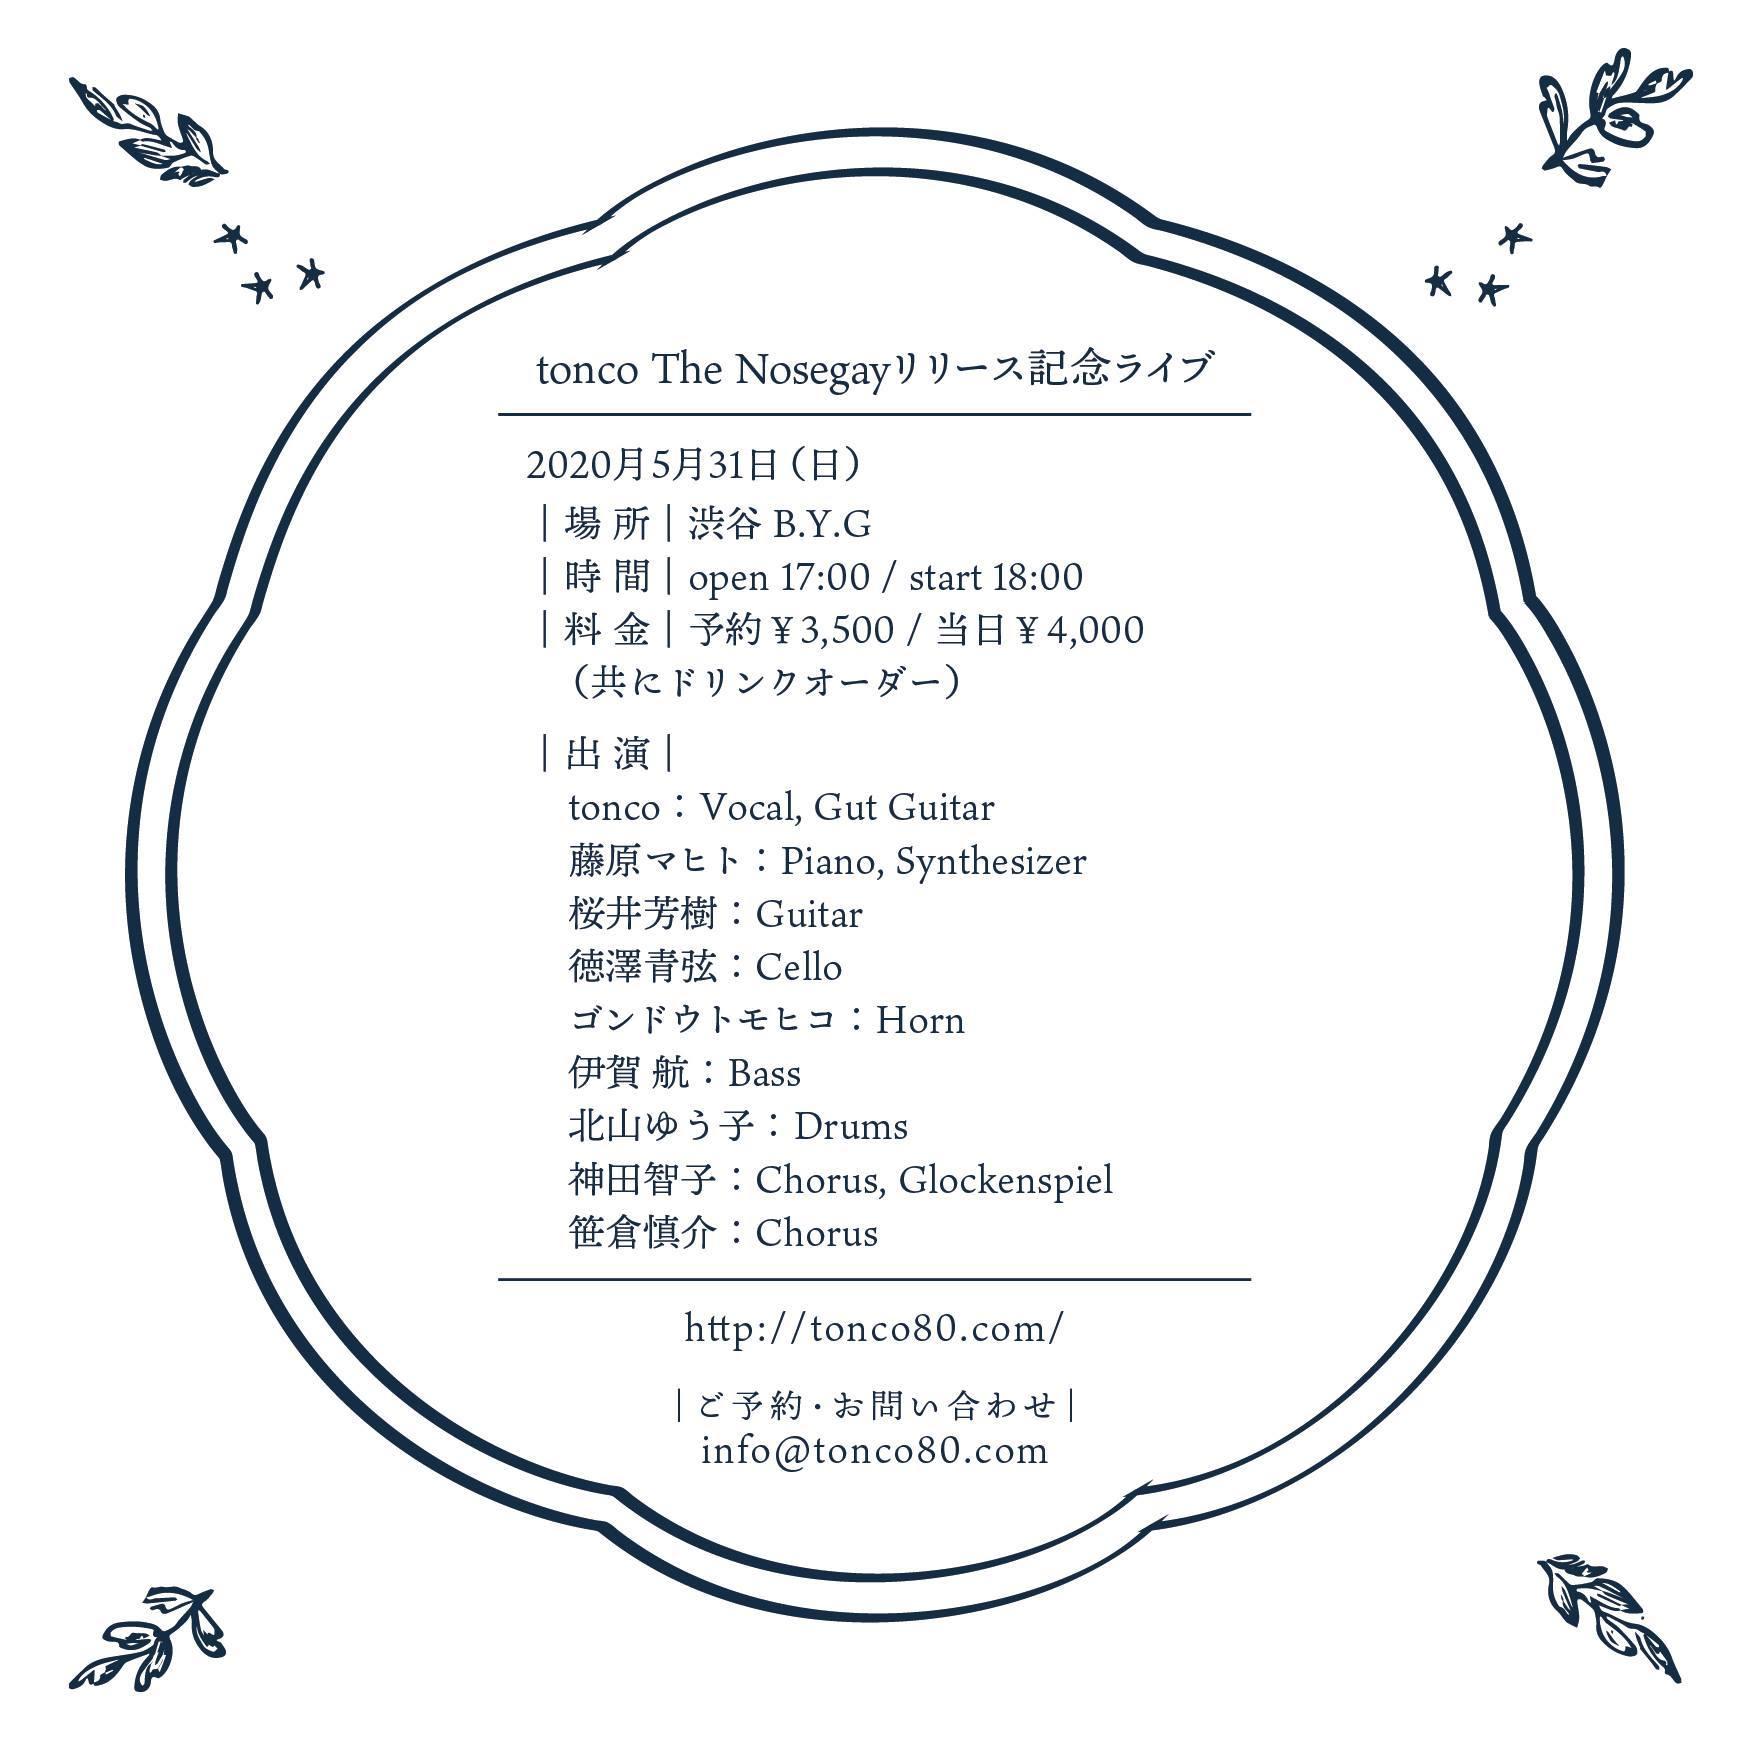 tonco The Nosegayリリース記念ライブの振替公演が5/31(日)に決定_b0185236_12105176.jpg